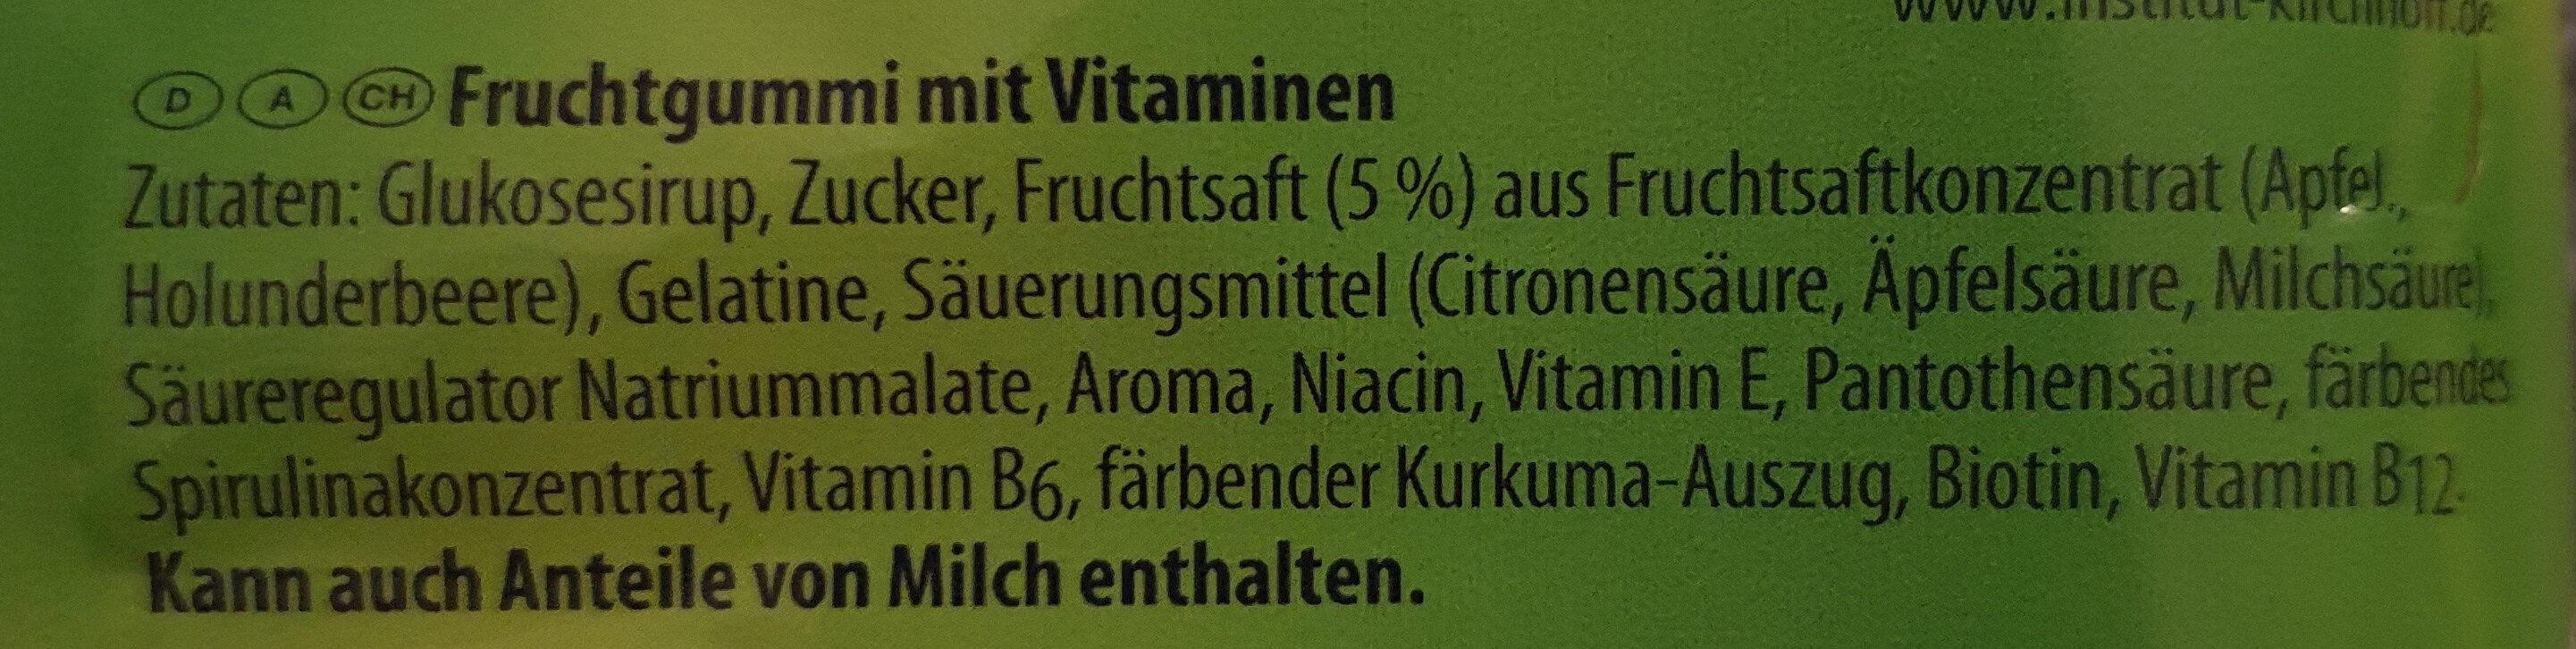 Lachgummi Apfellinge - Ingredients - de